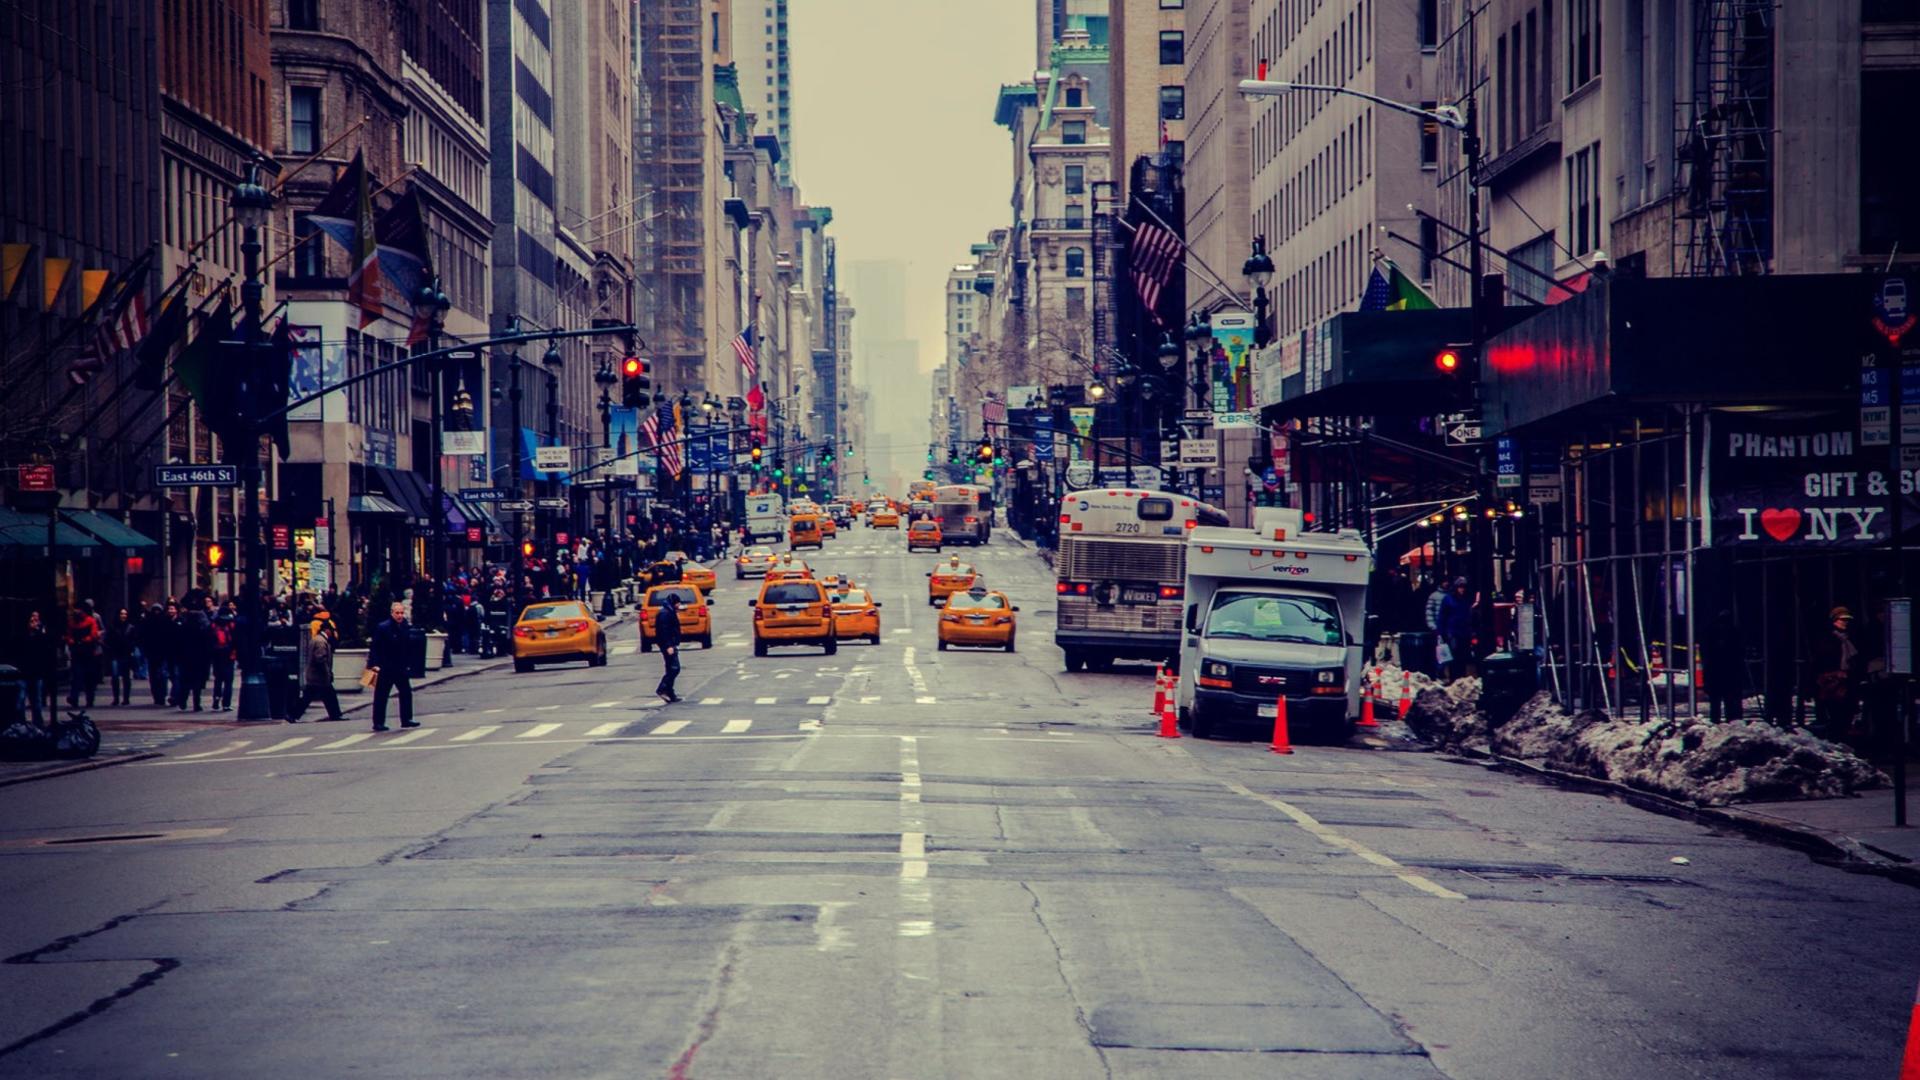 Обои new york city, машины, америка, улица, сша. Города foto 11